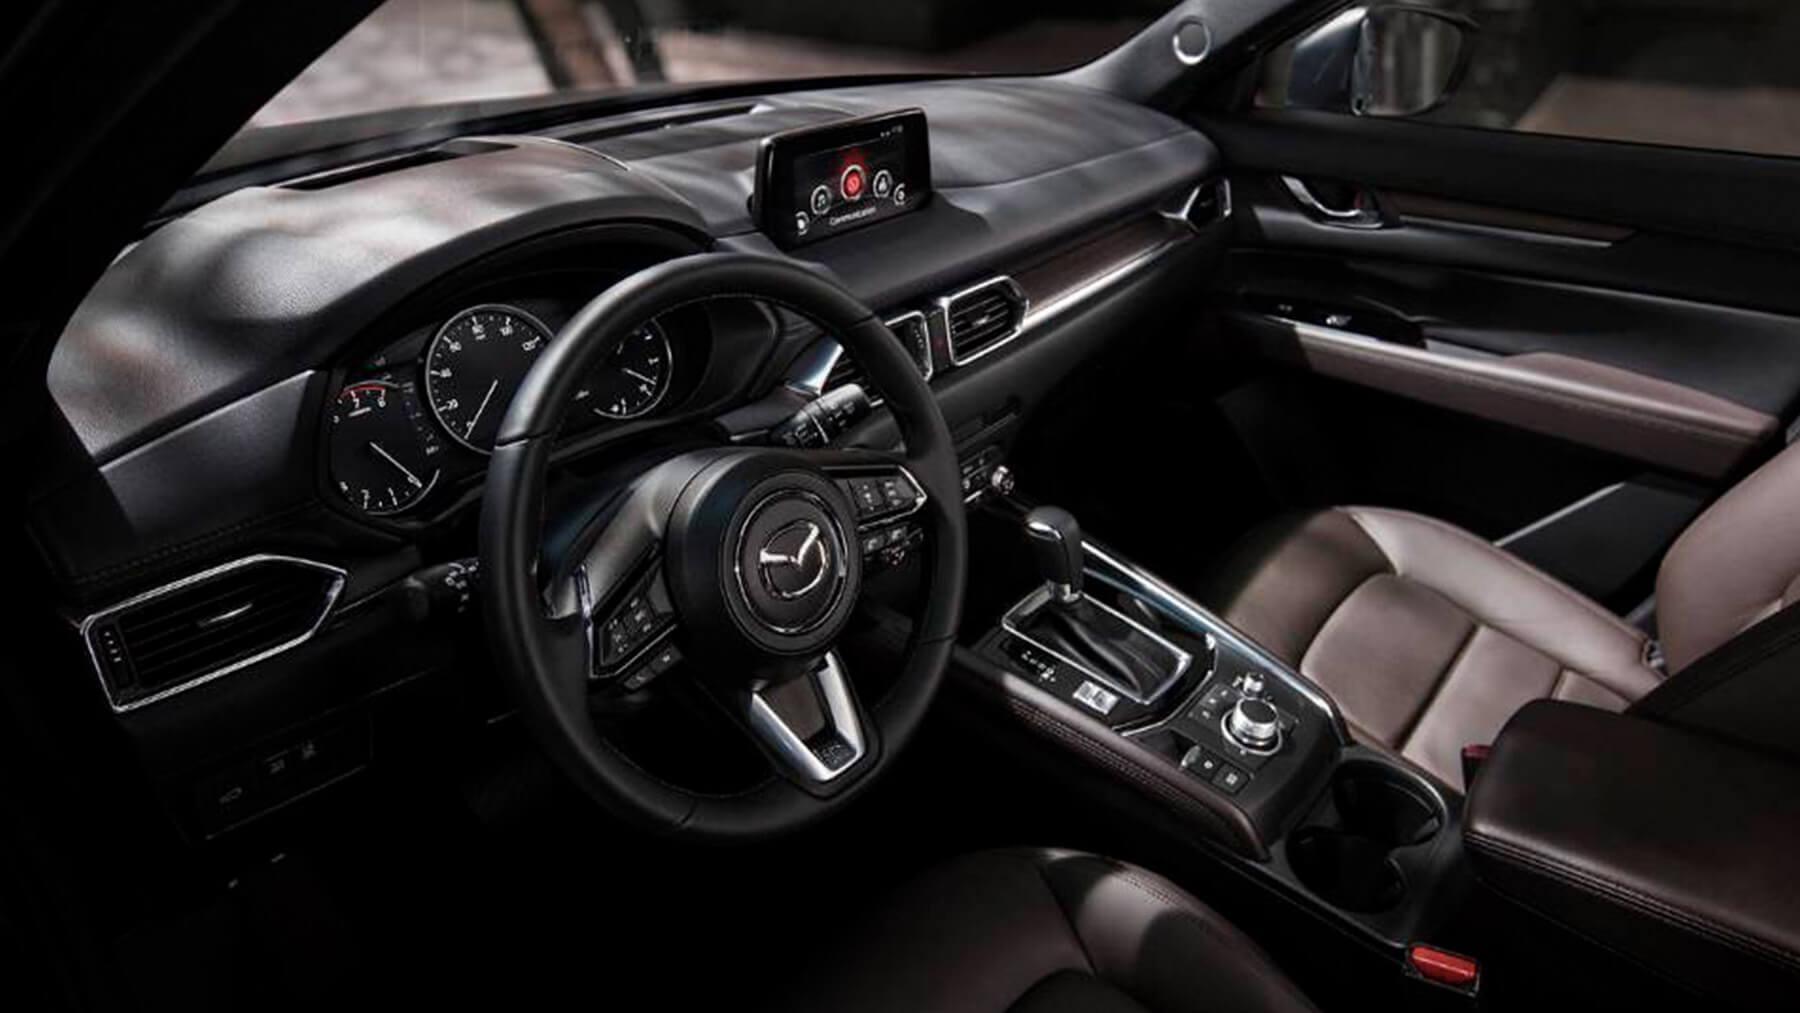 Galeria - Mazda CX-5